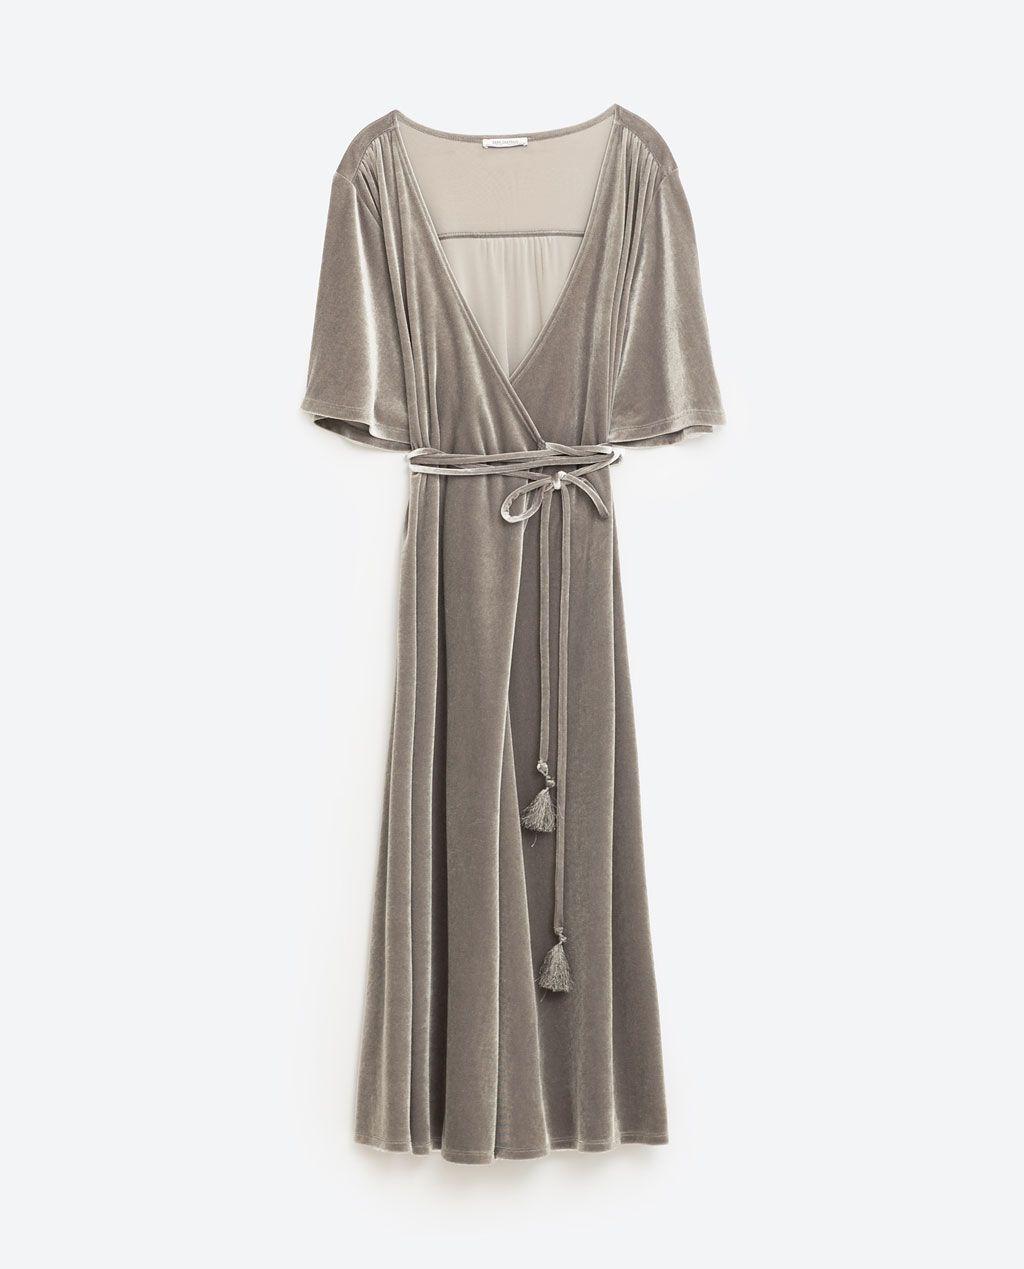 c145bef3 Image 8 of CROSSOVER VELVET DRESS from Zara | Zara | Zara velvet ...